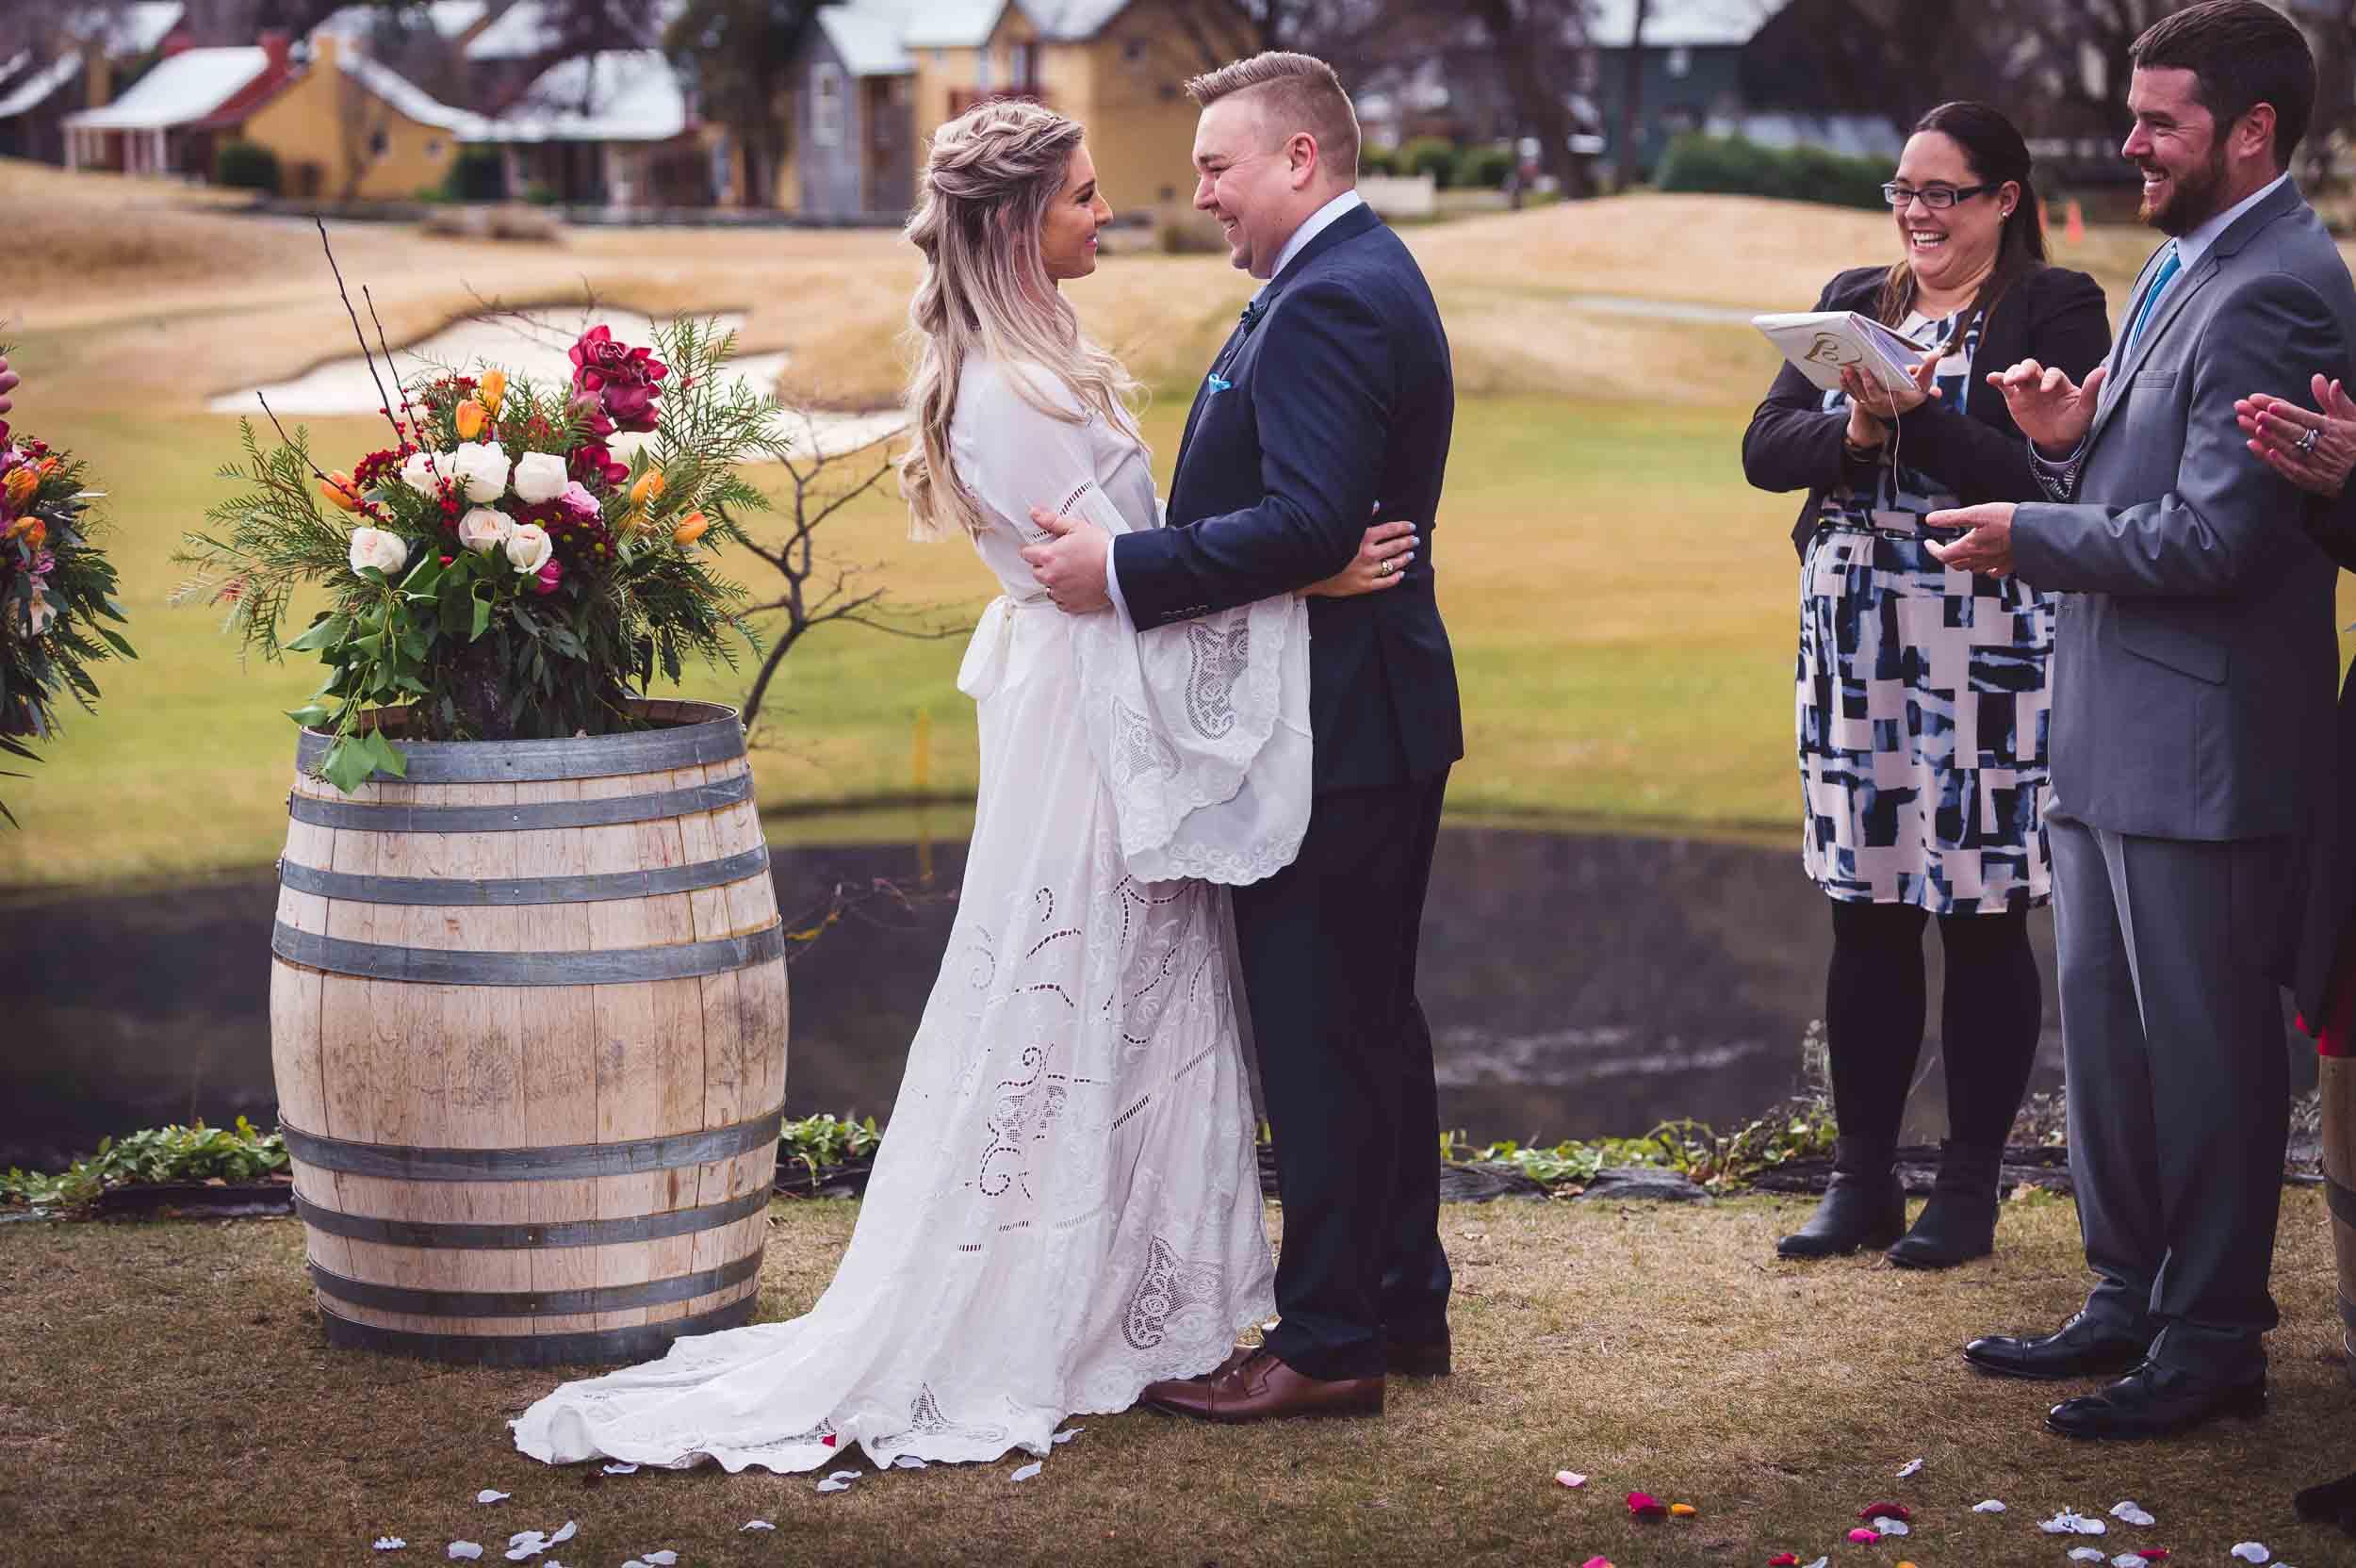 blog post wedding venues Laura + Nick | Winter Wedding at Milbrook Resort fallon photography